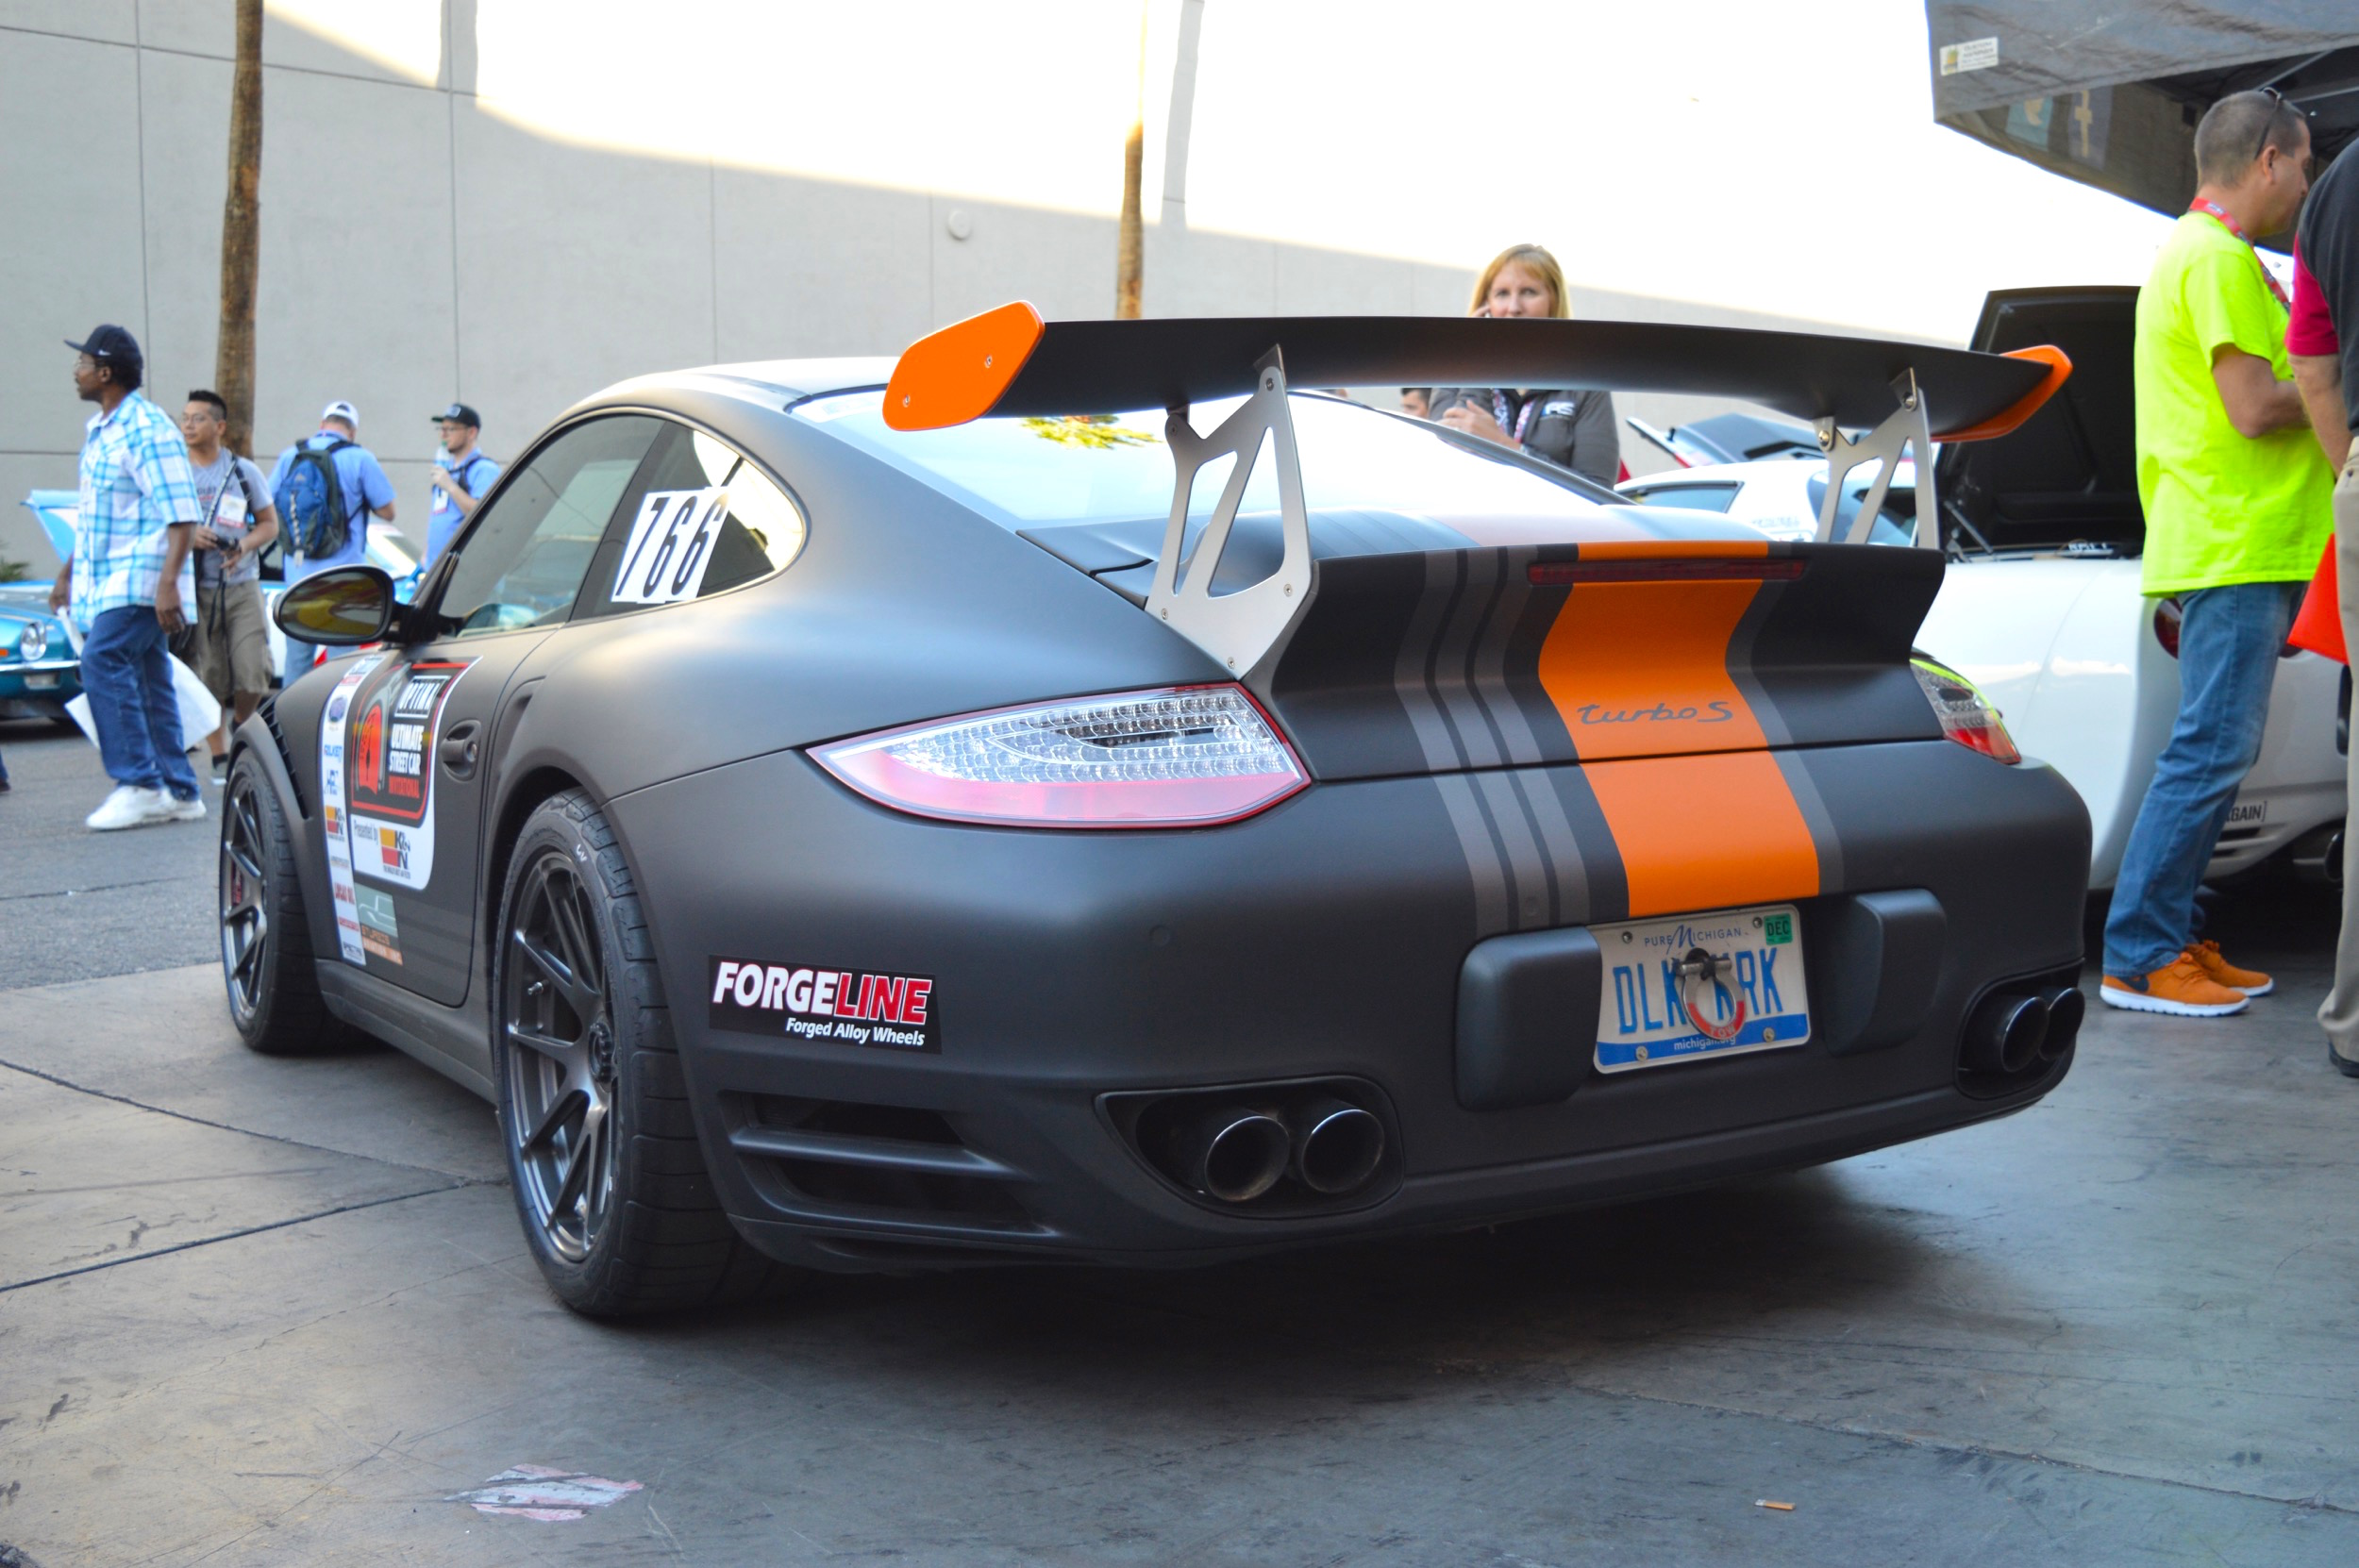 Danny King S 997 Porsche 911 Turbo S On Center Locking Forgeline One